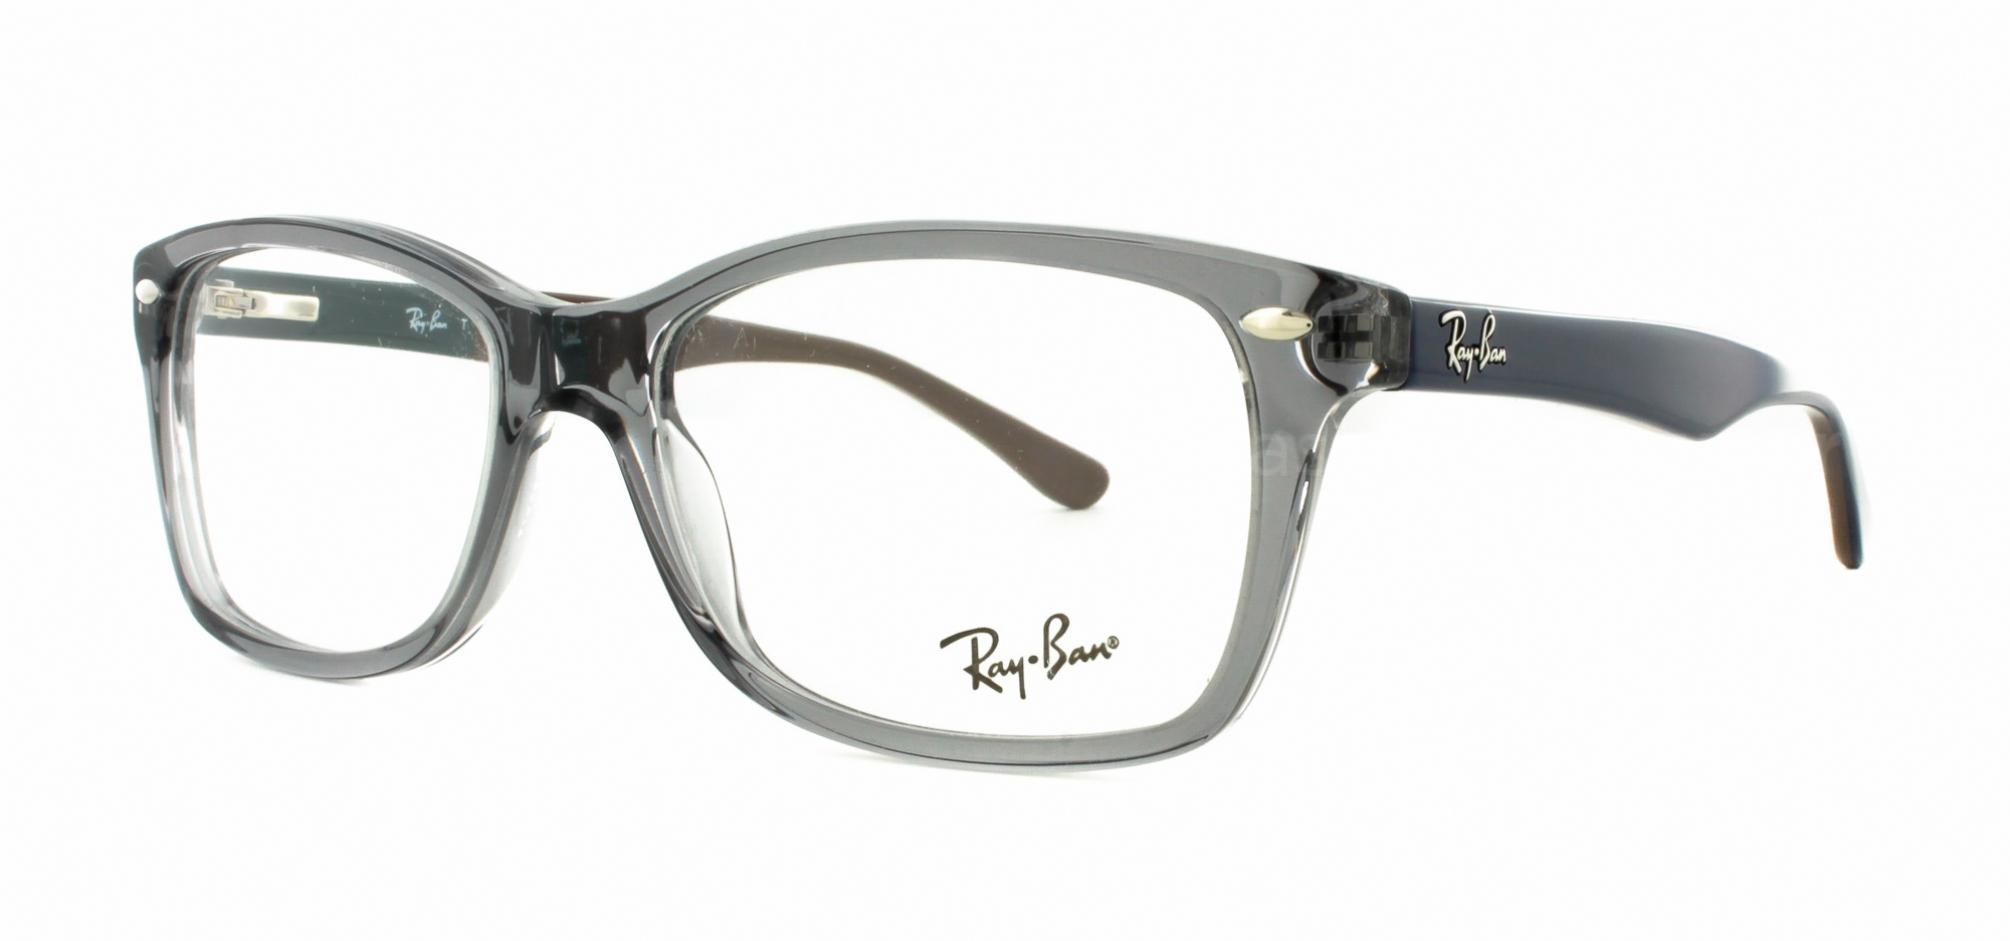 ae29e6b34d Ray Ban Rx 5228 Eyeglasses 5546 Grey - Bitterroot Public Library